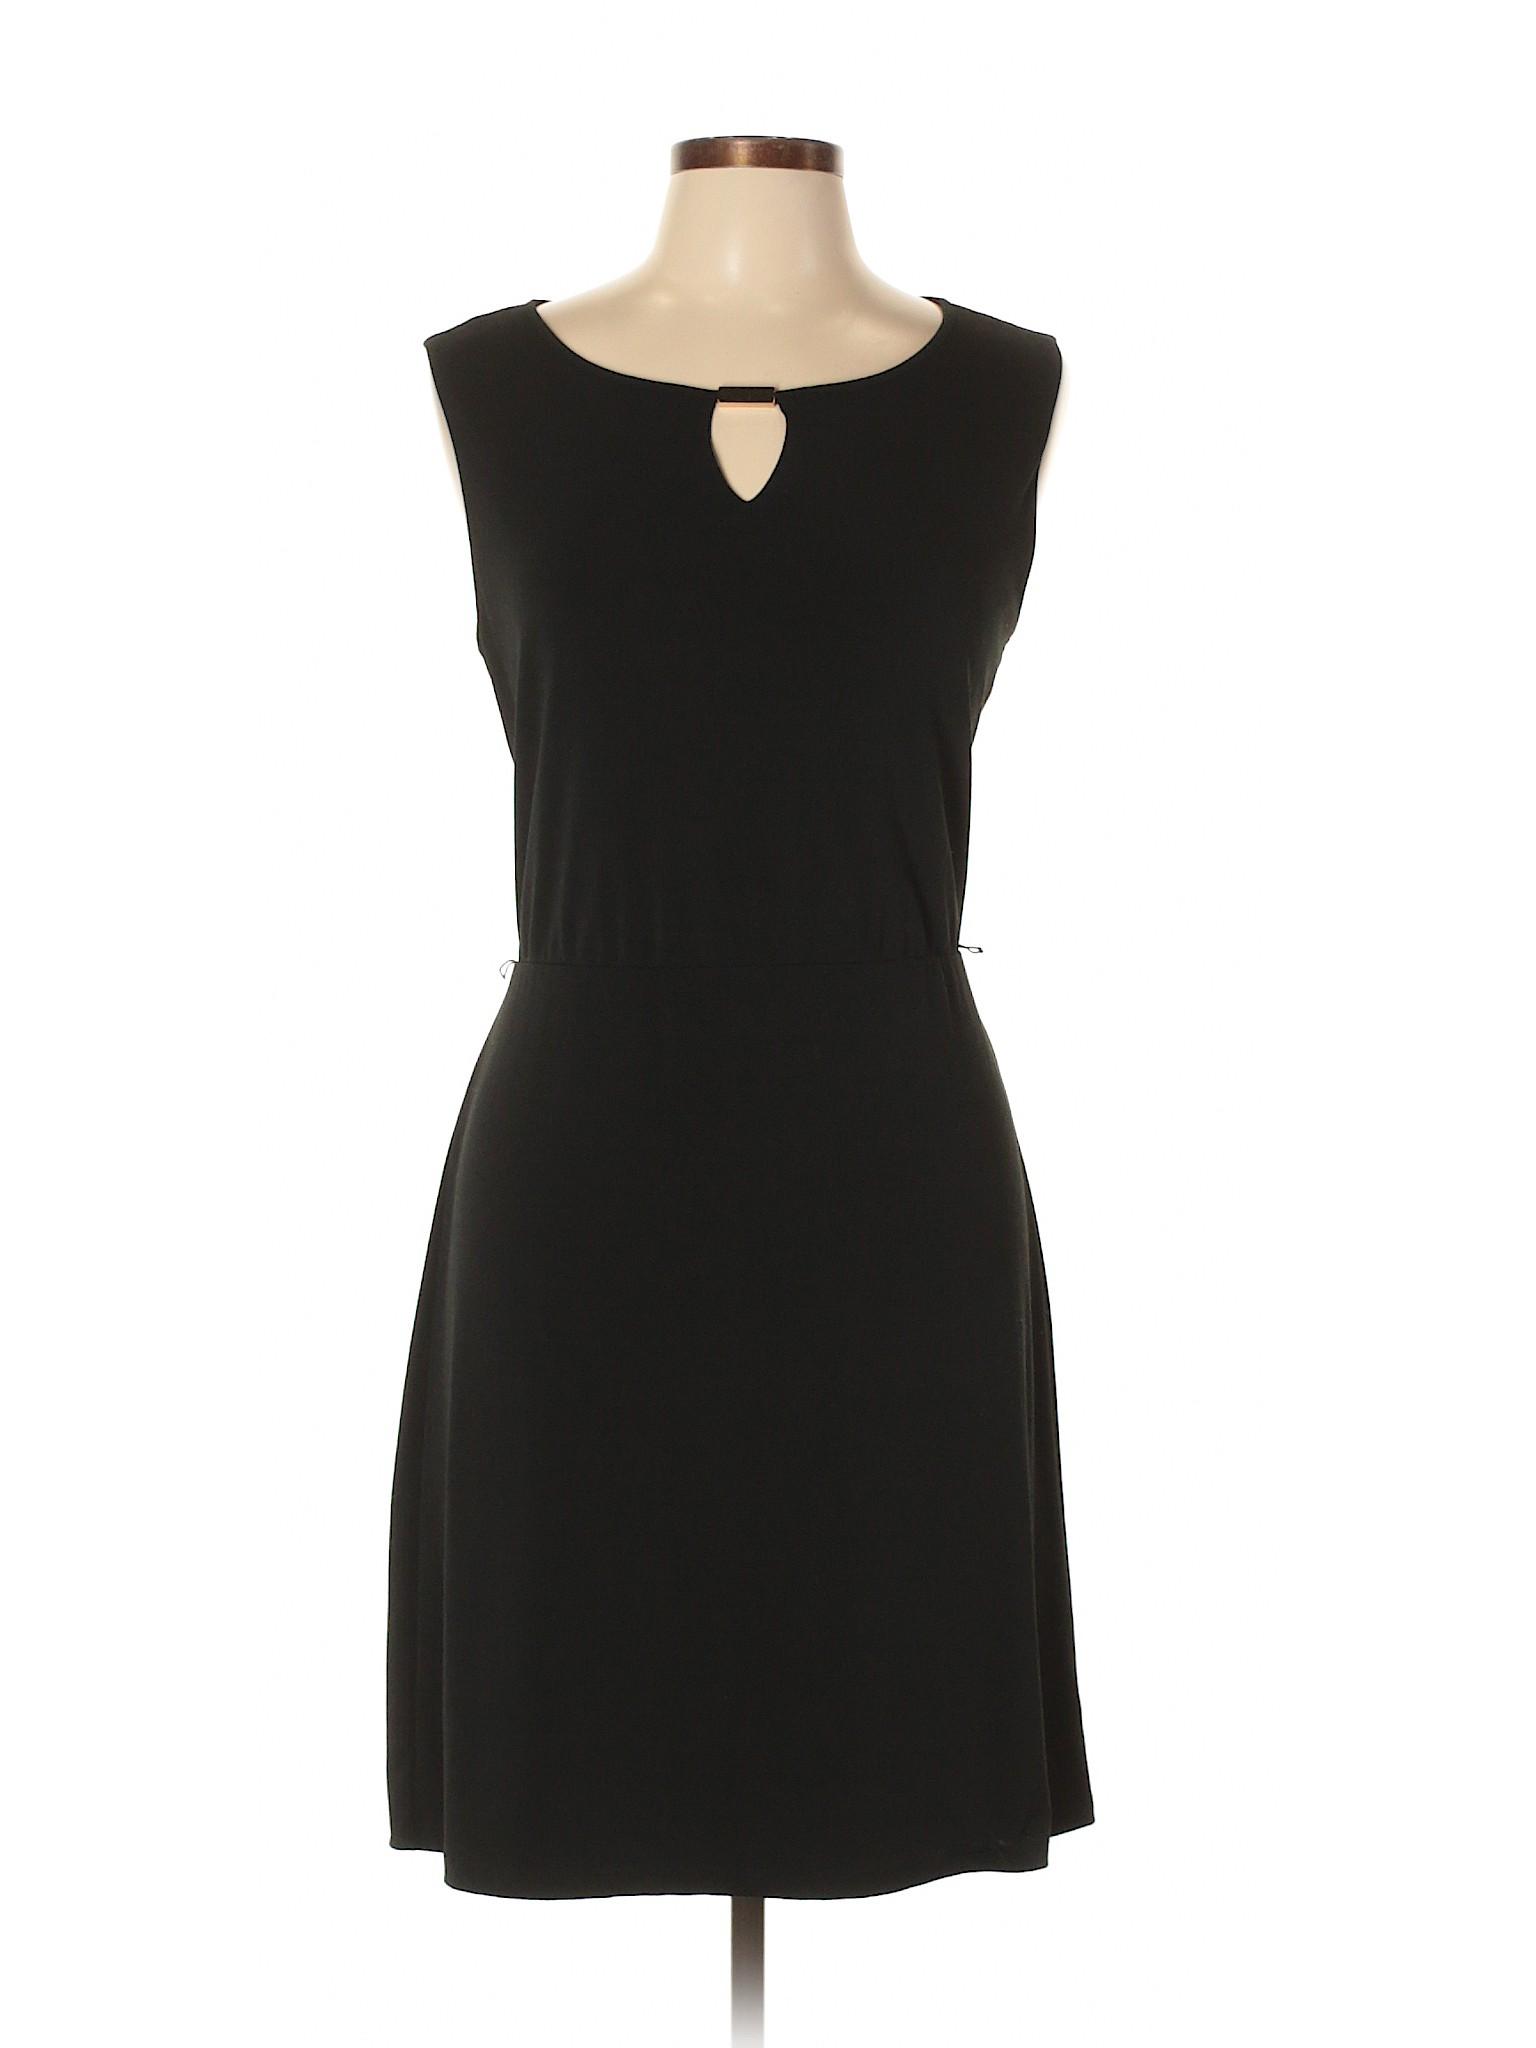 Casual Selling Selling Ann Ann Casual Dress Selling Ann Taylor Dress Taylor pBApwz